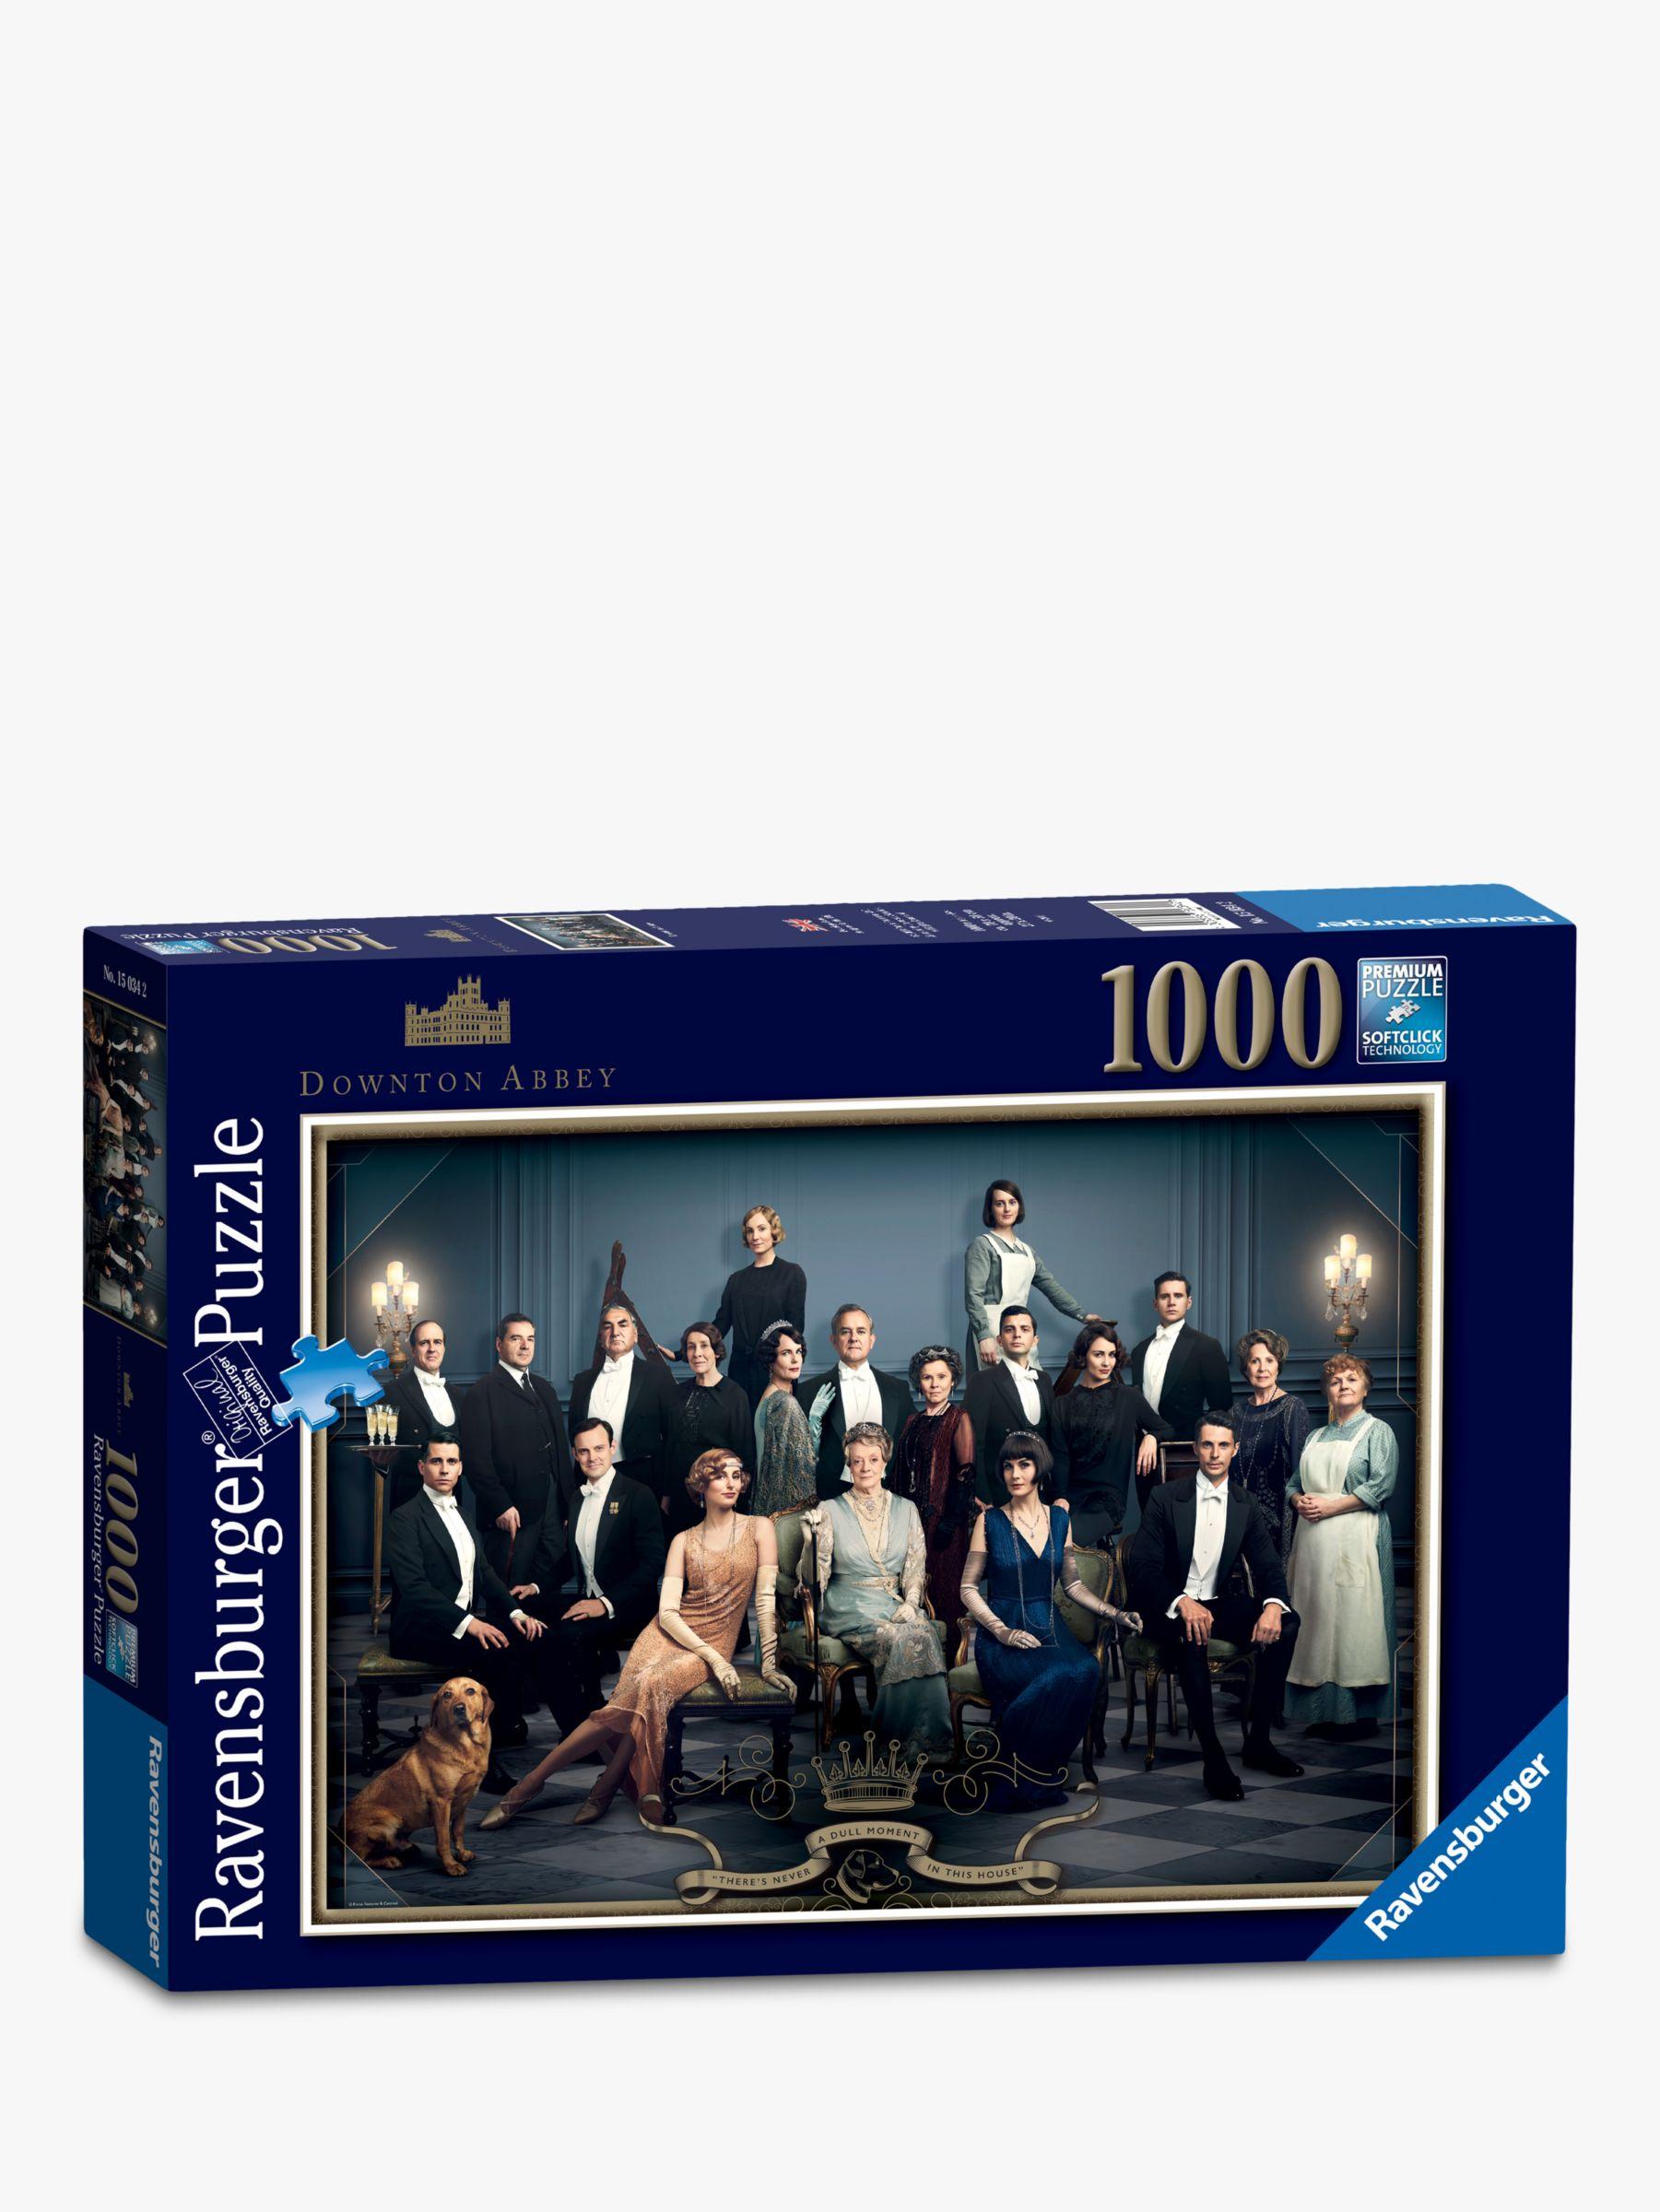 Ravensburger Ravensburger Downton Abbey Jigsaw Puzzle, 1000 Pieces